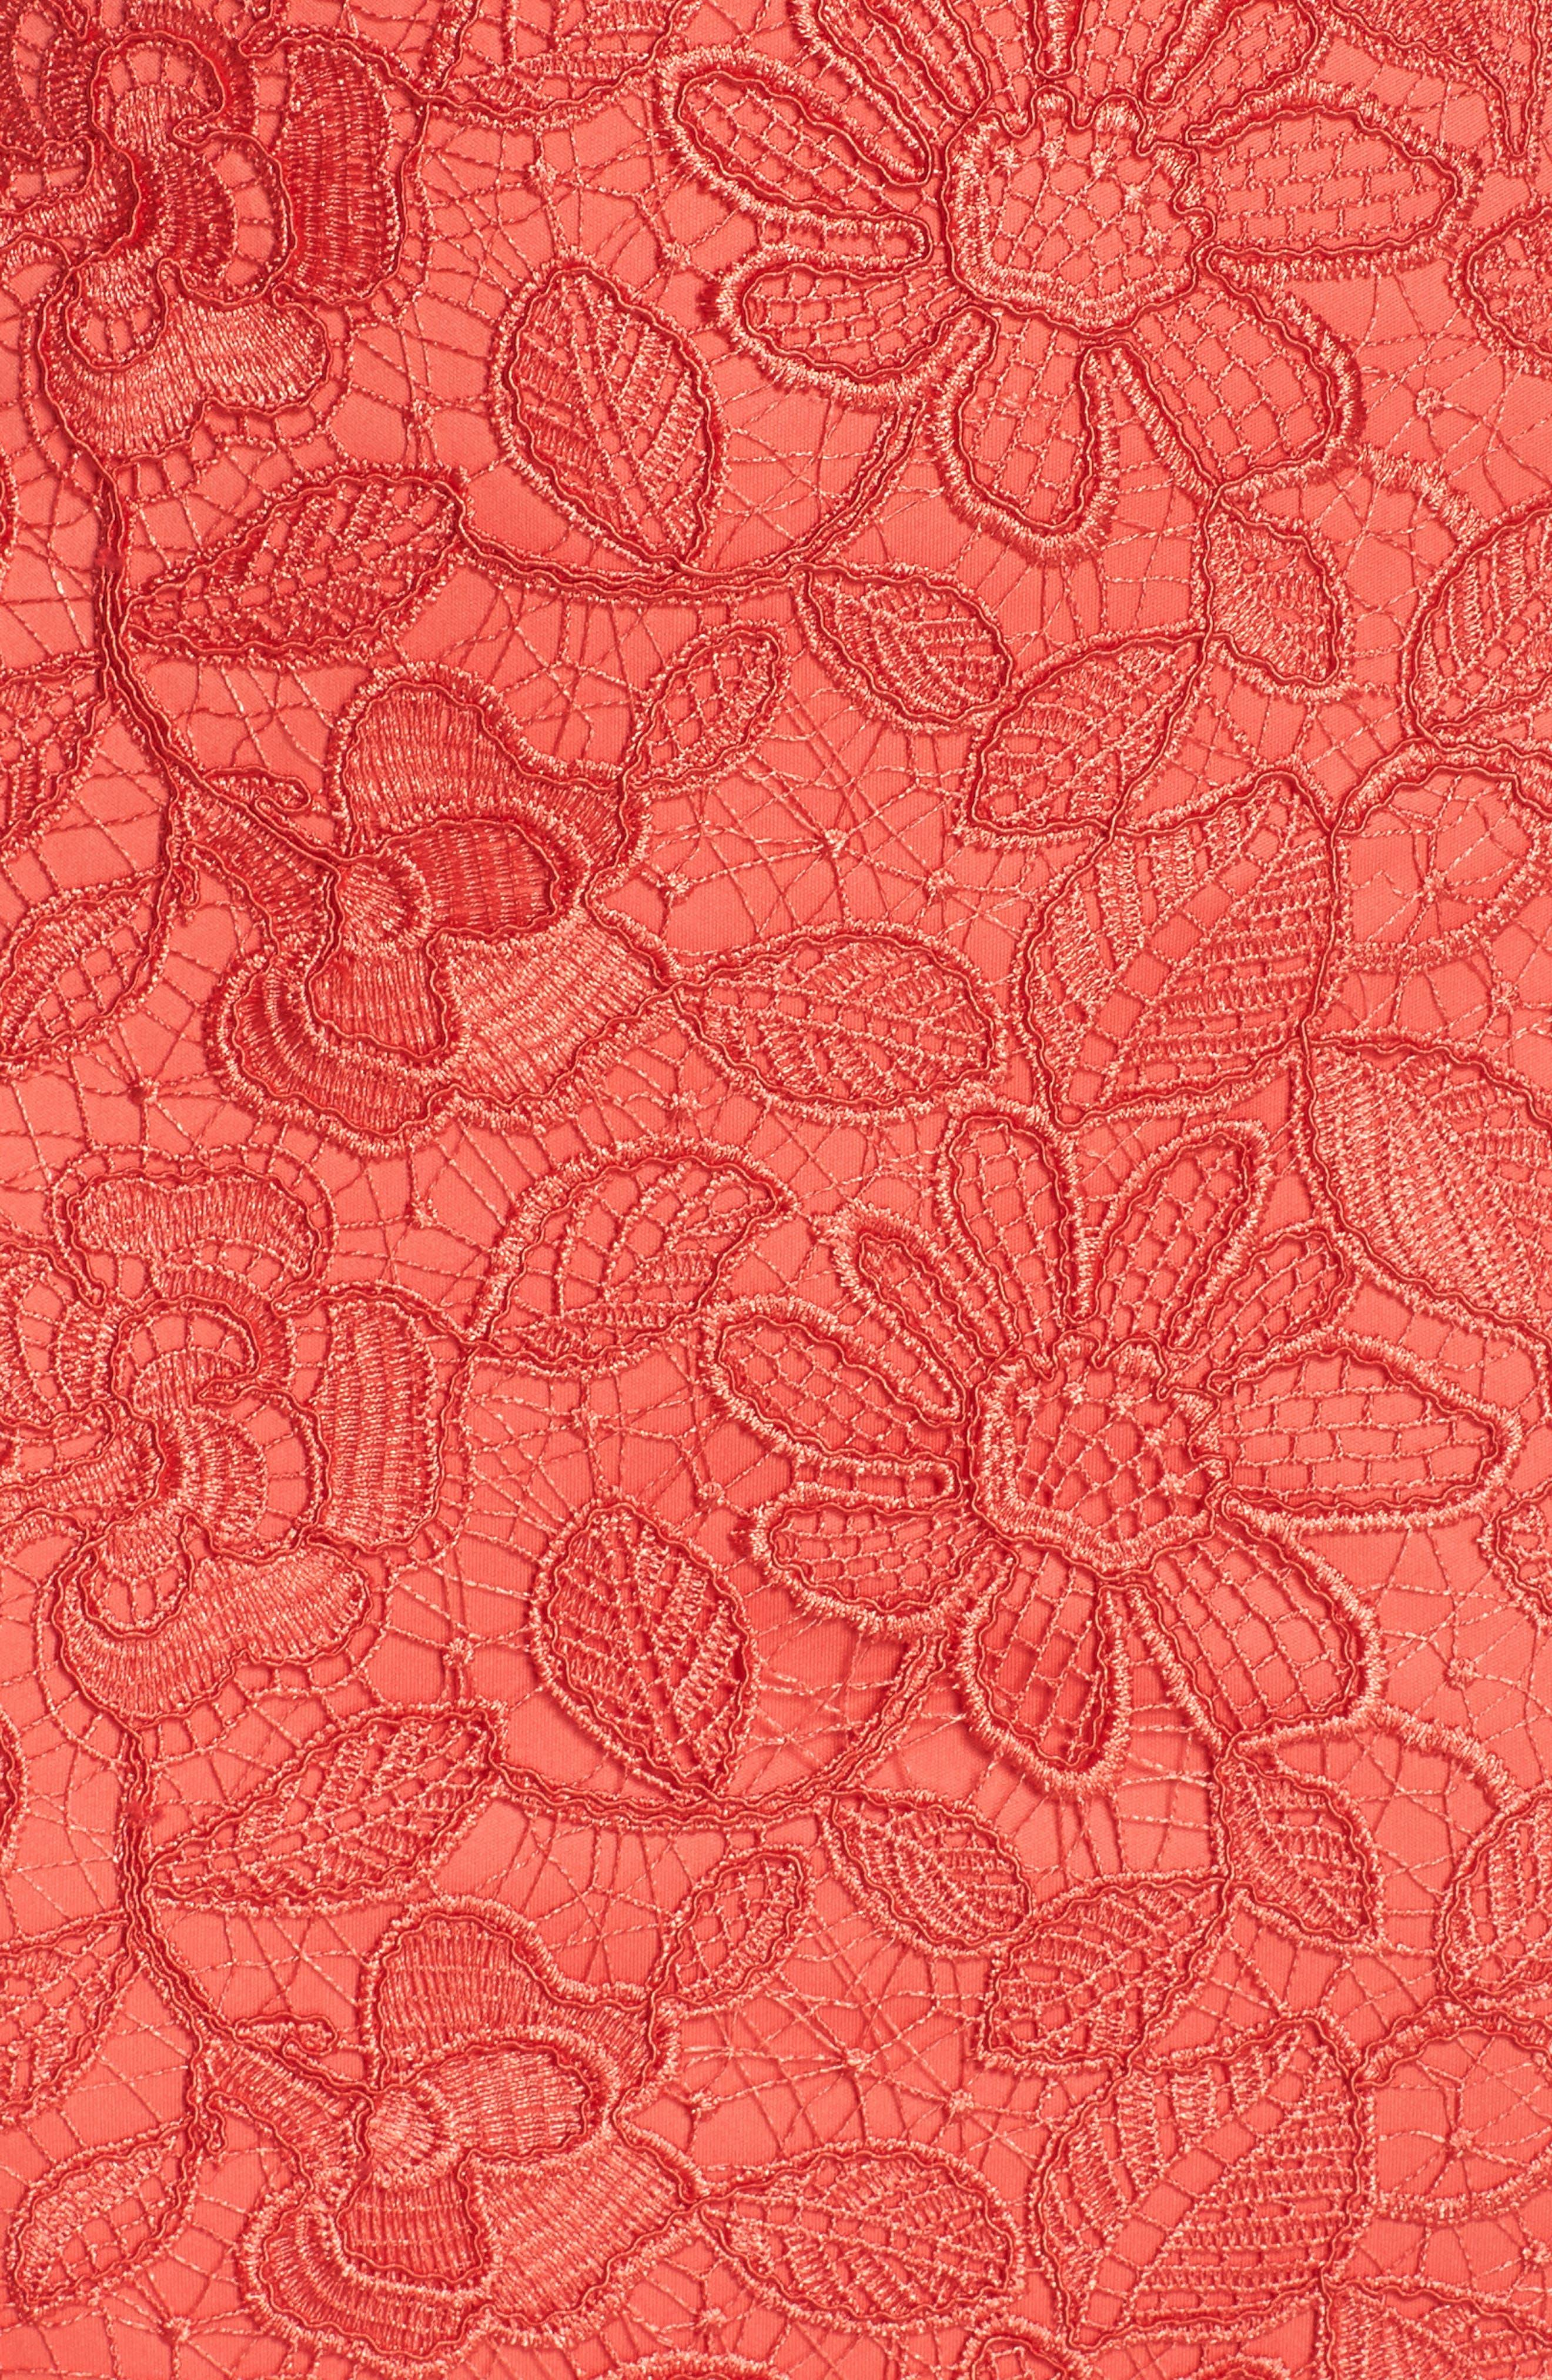 Floral Lace Trumpet Gown,                             Alternate thumbnail 5, color,                             Red/ Jasper